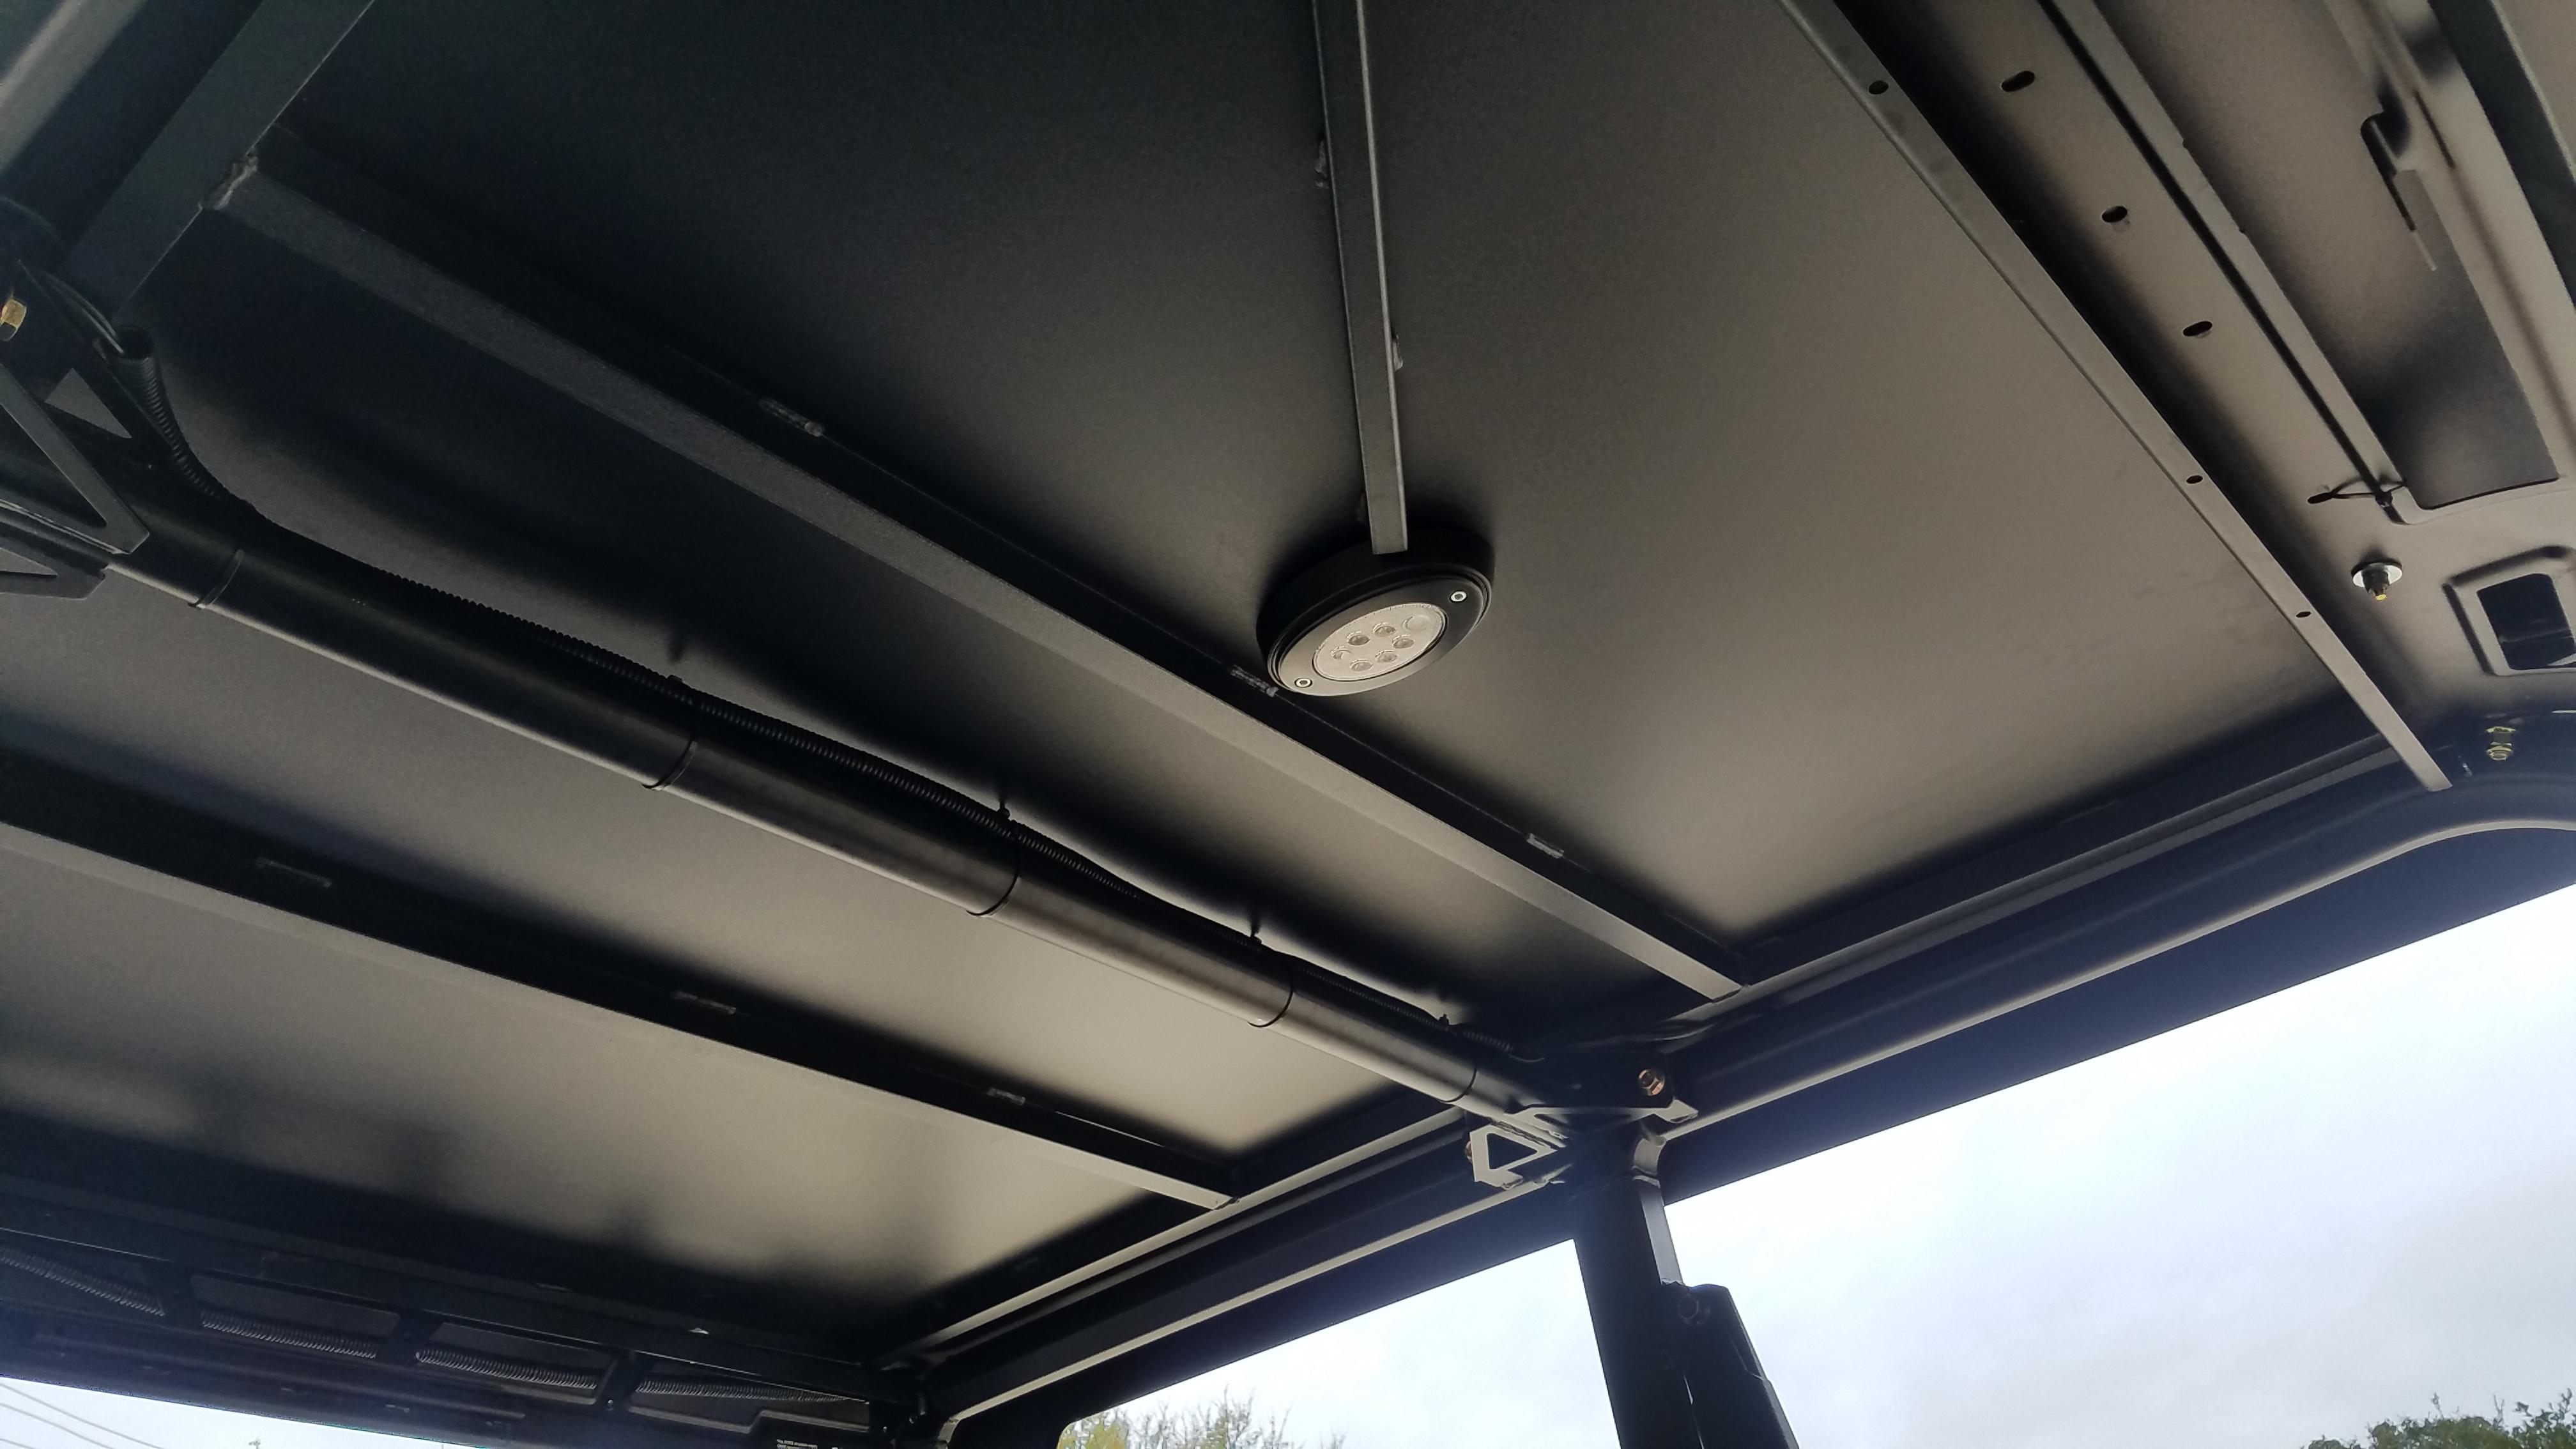 polaris-ranger-mid-size-crew-metal-roof-led-dome-light-option-under-side.jpg